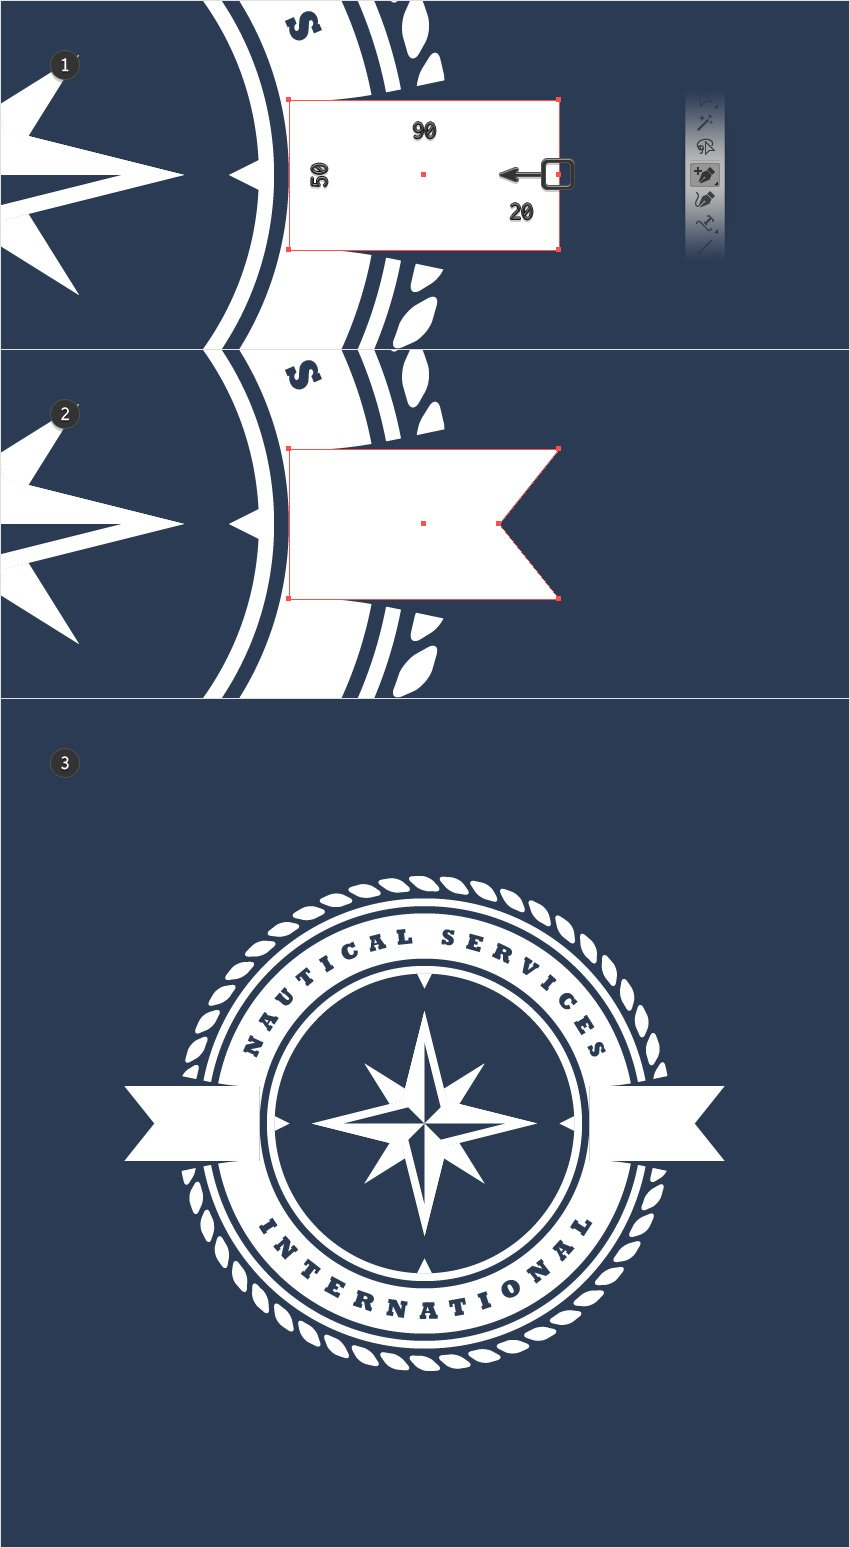 add anchor point